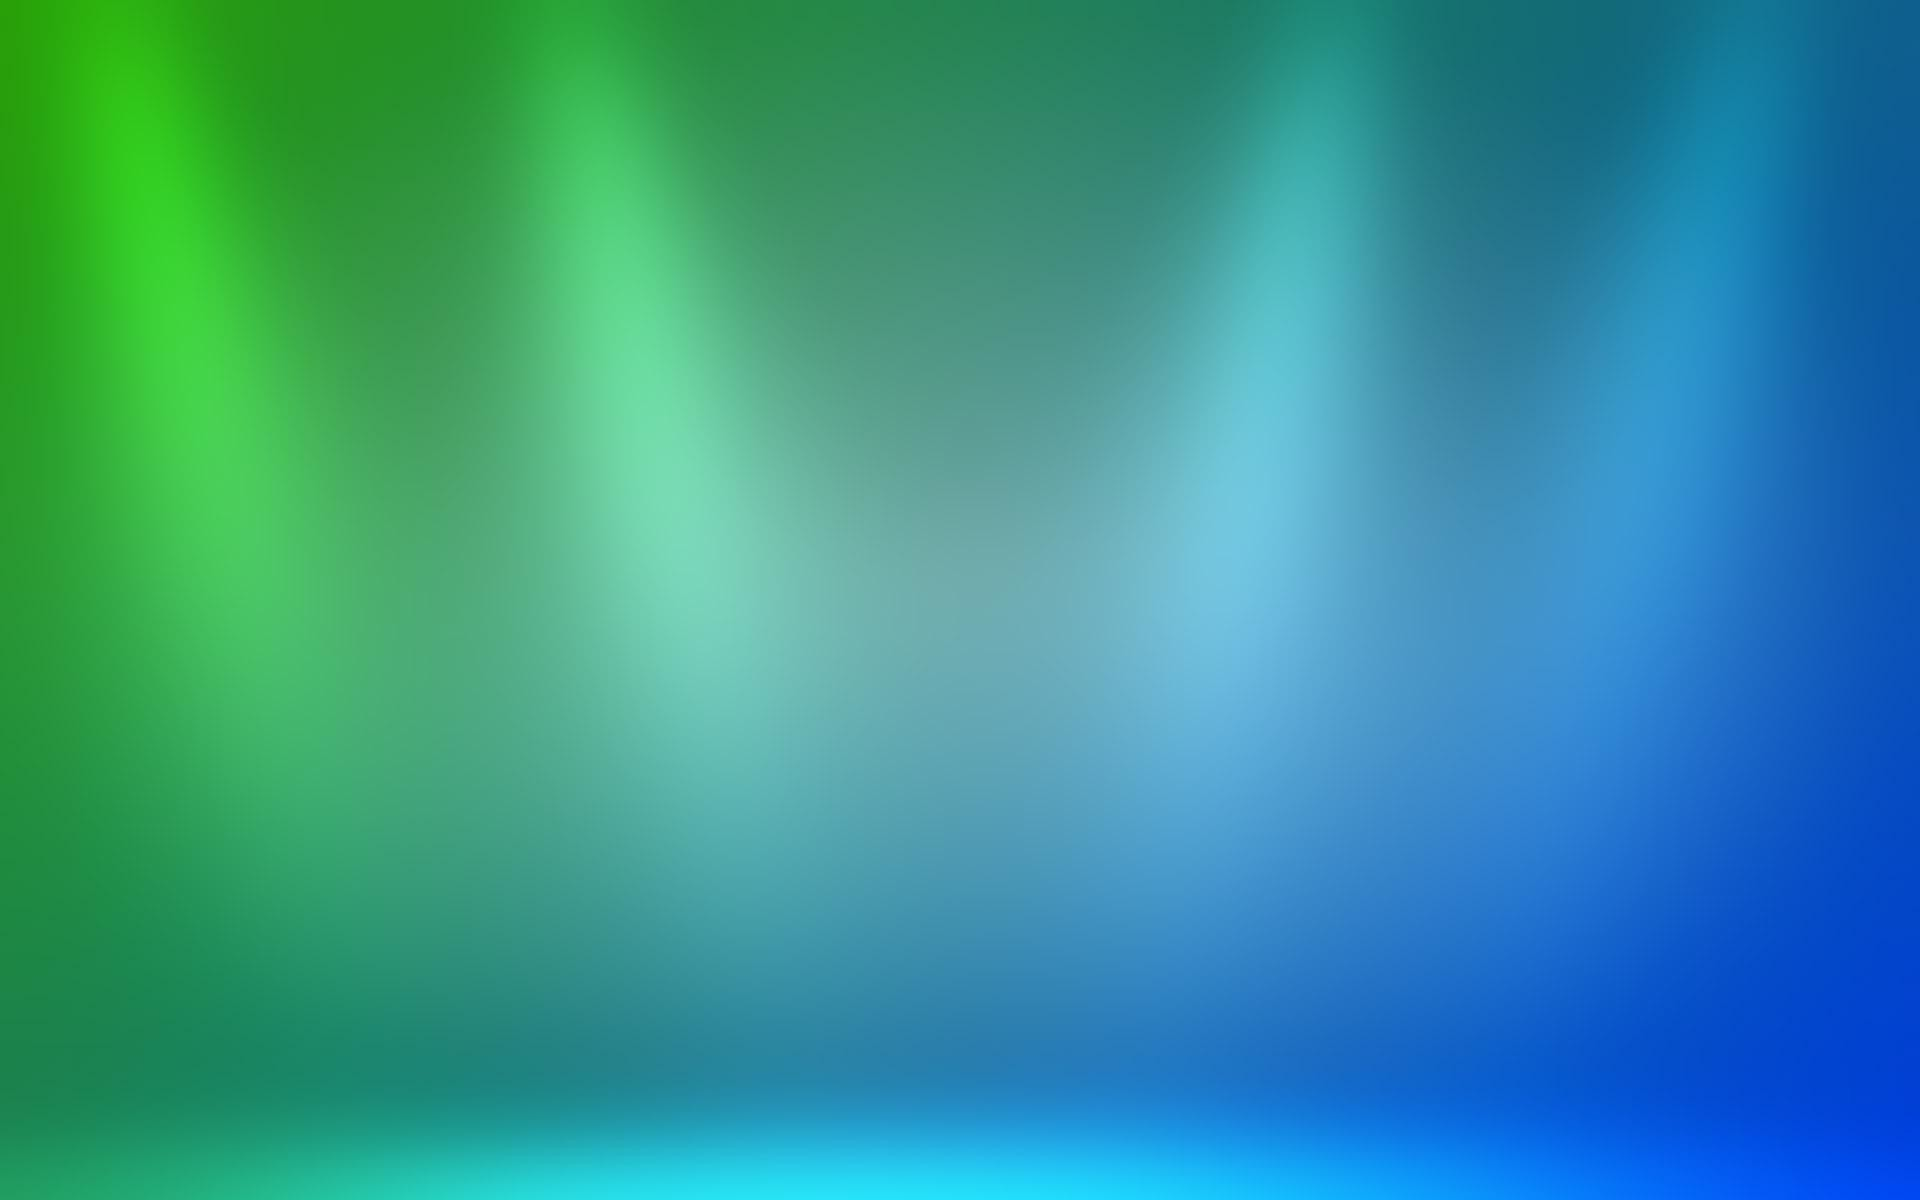 Light Blue Green Wallpaper 72 images